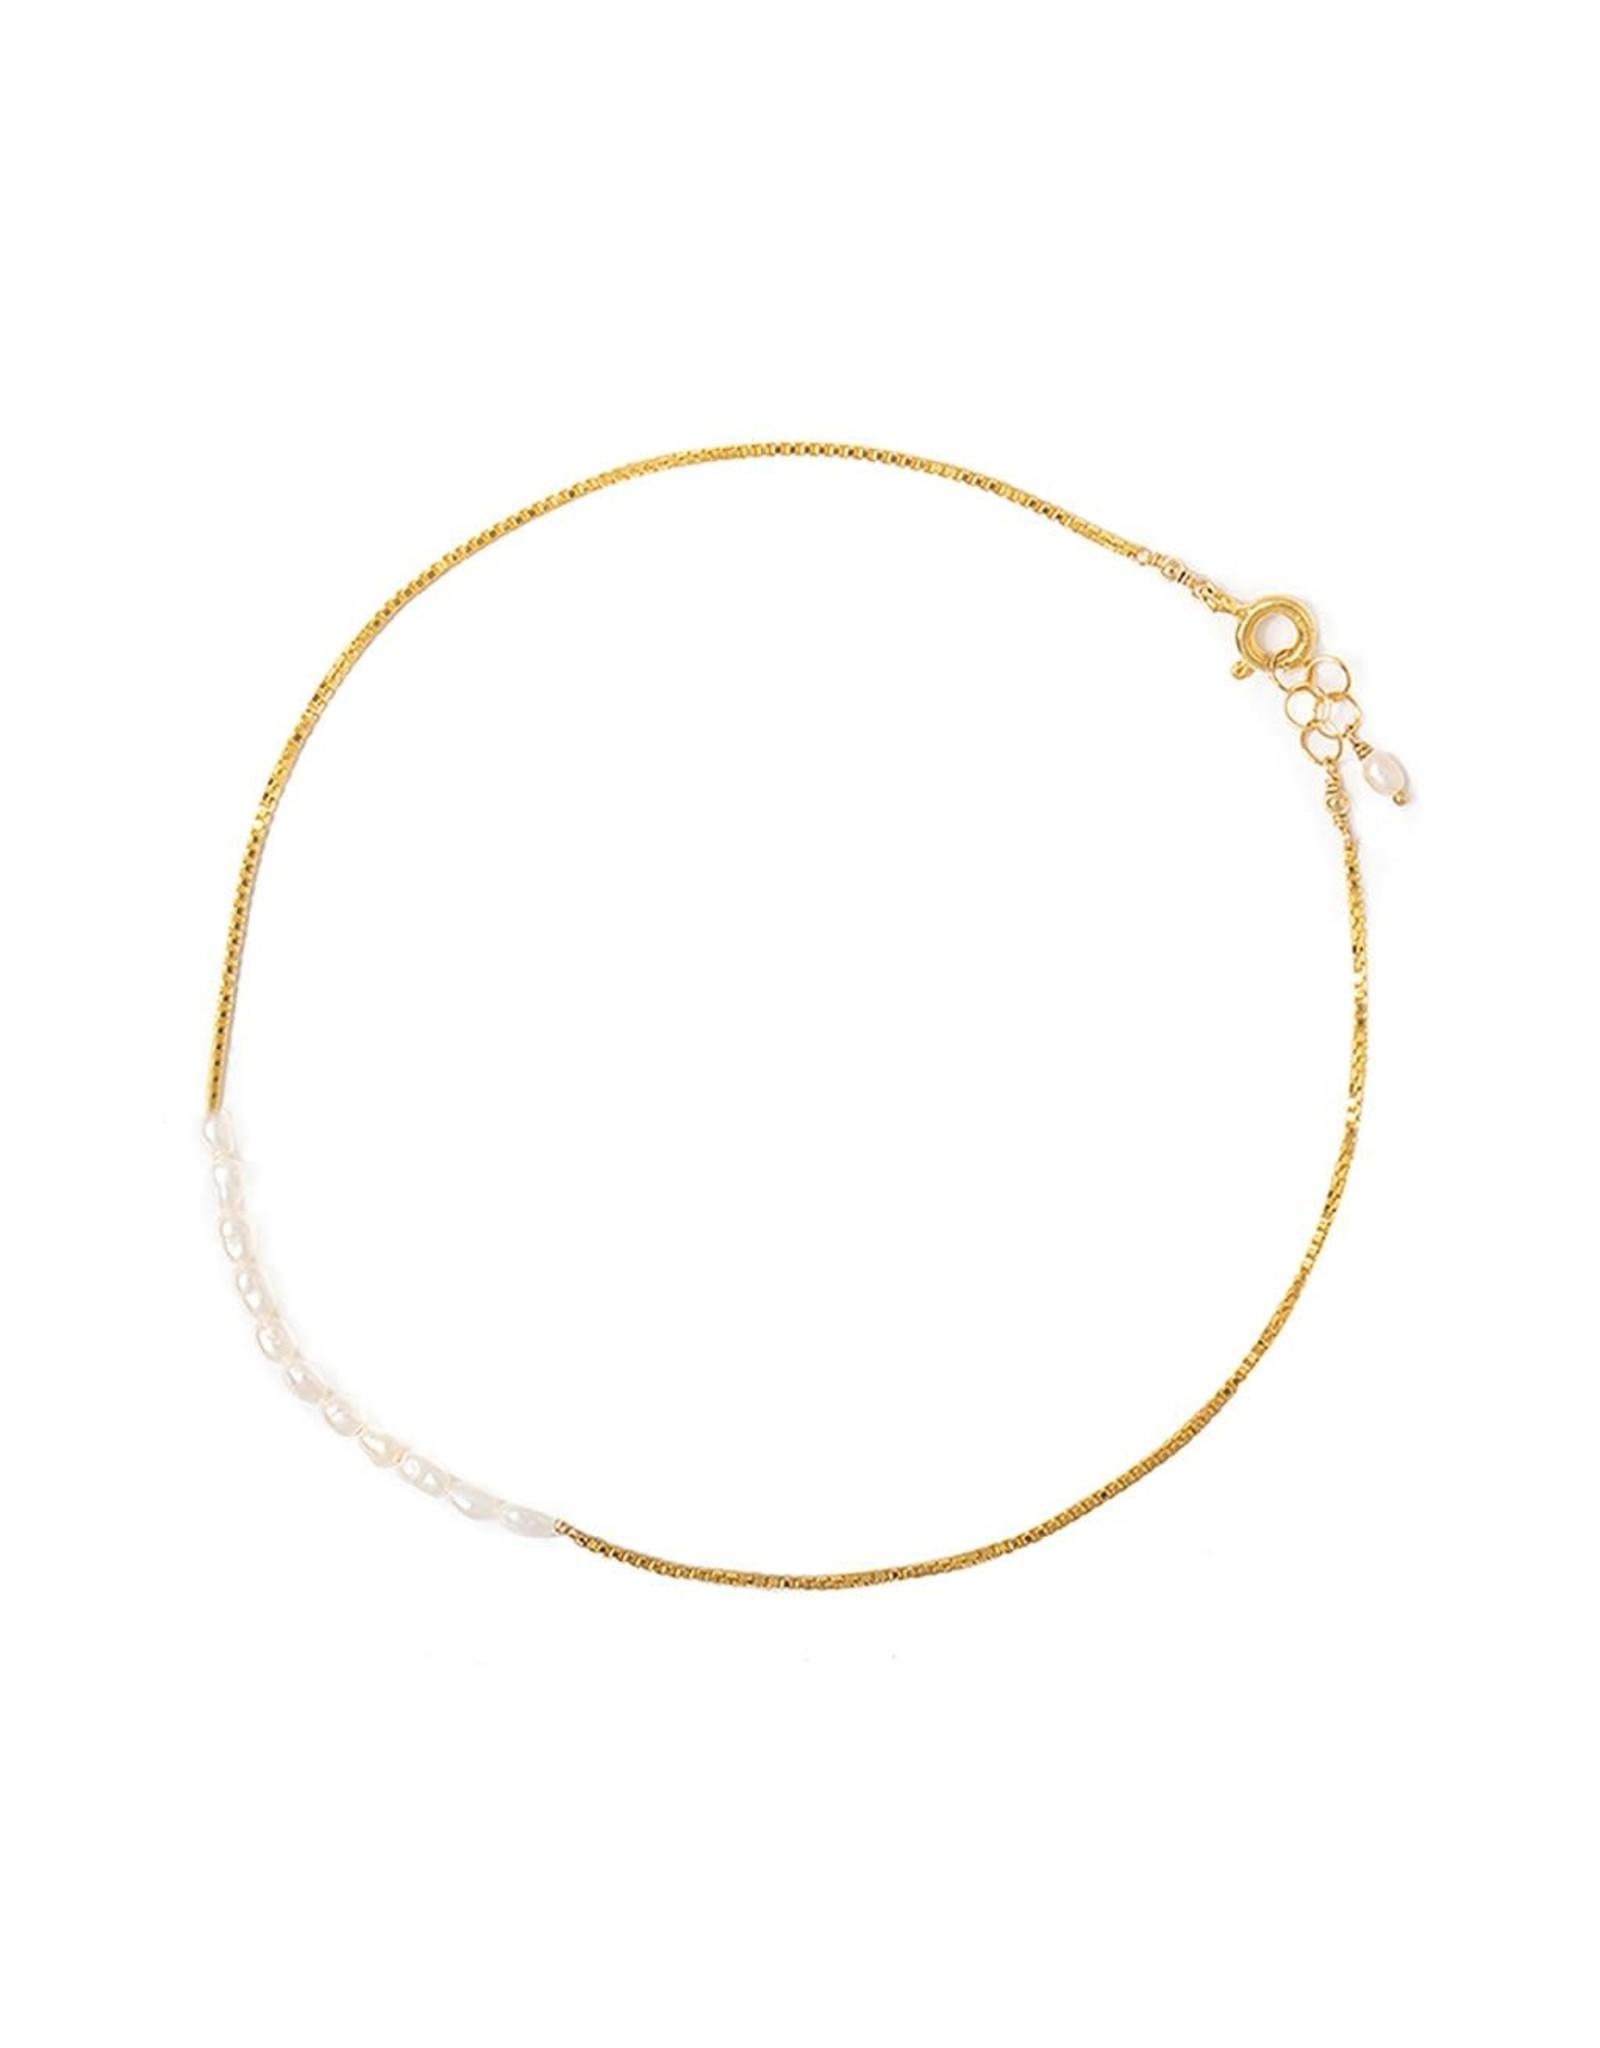 leah alexandra Pearl Bar Anklet | Goldfill